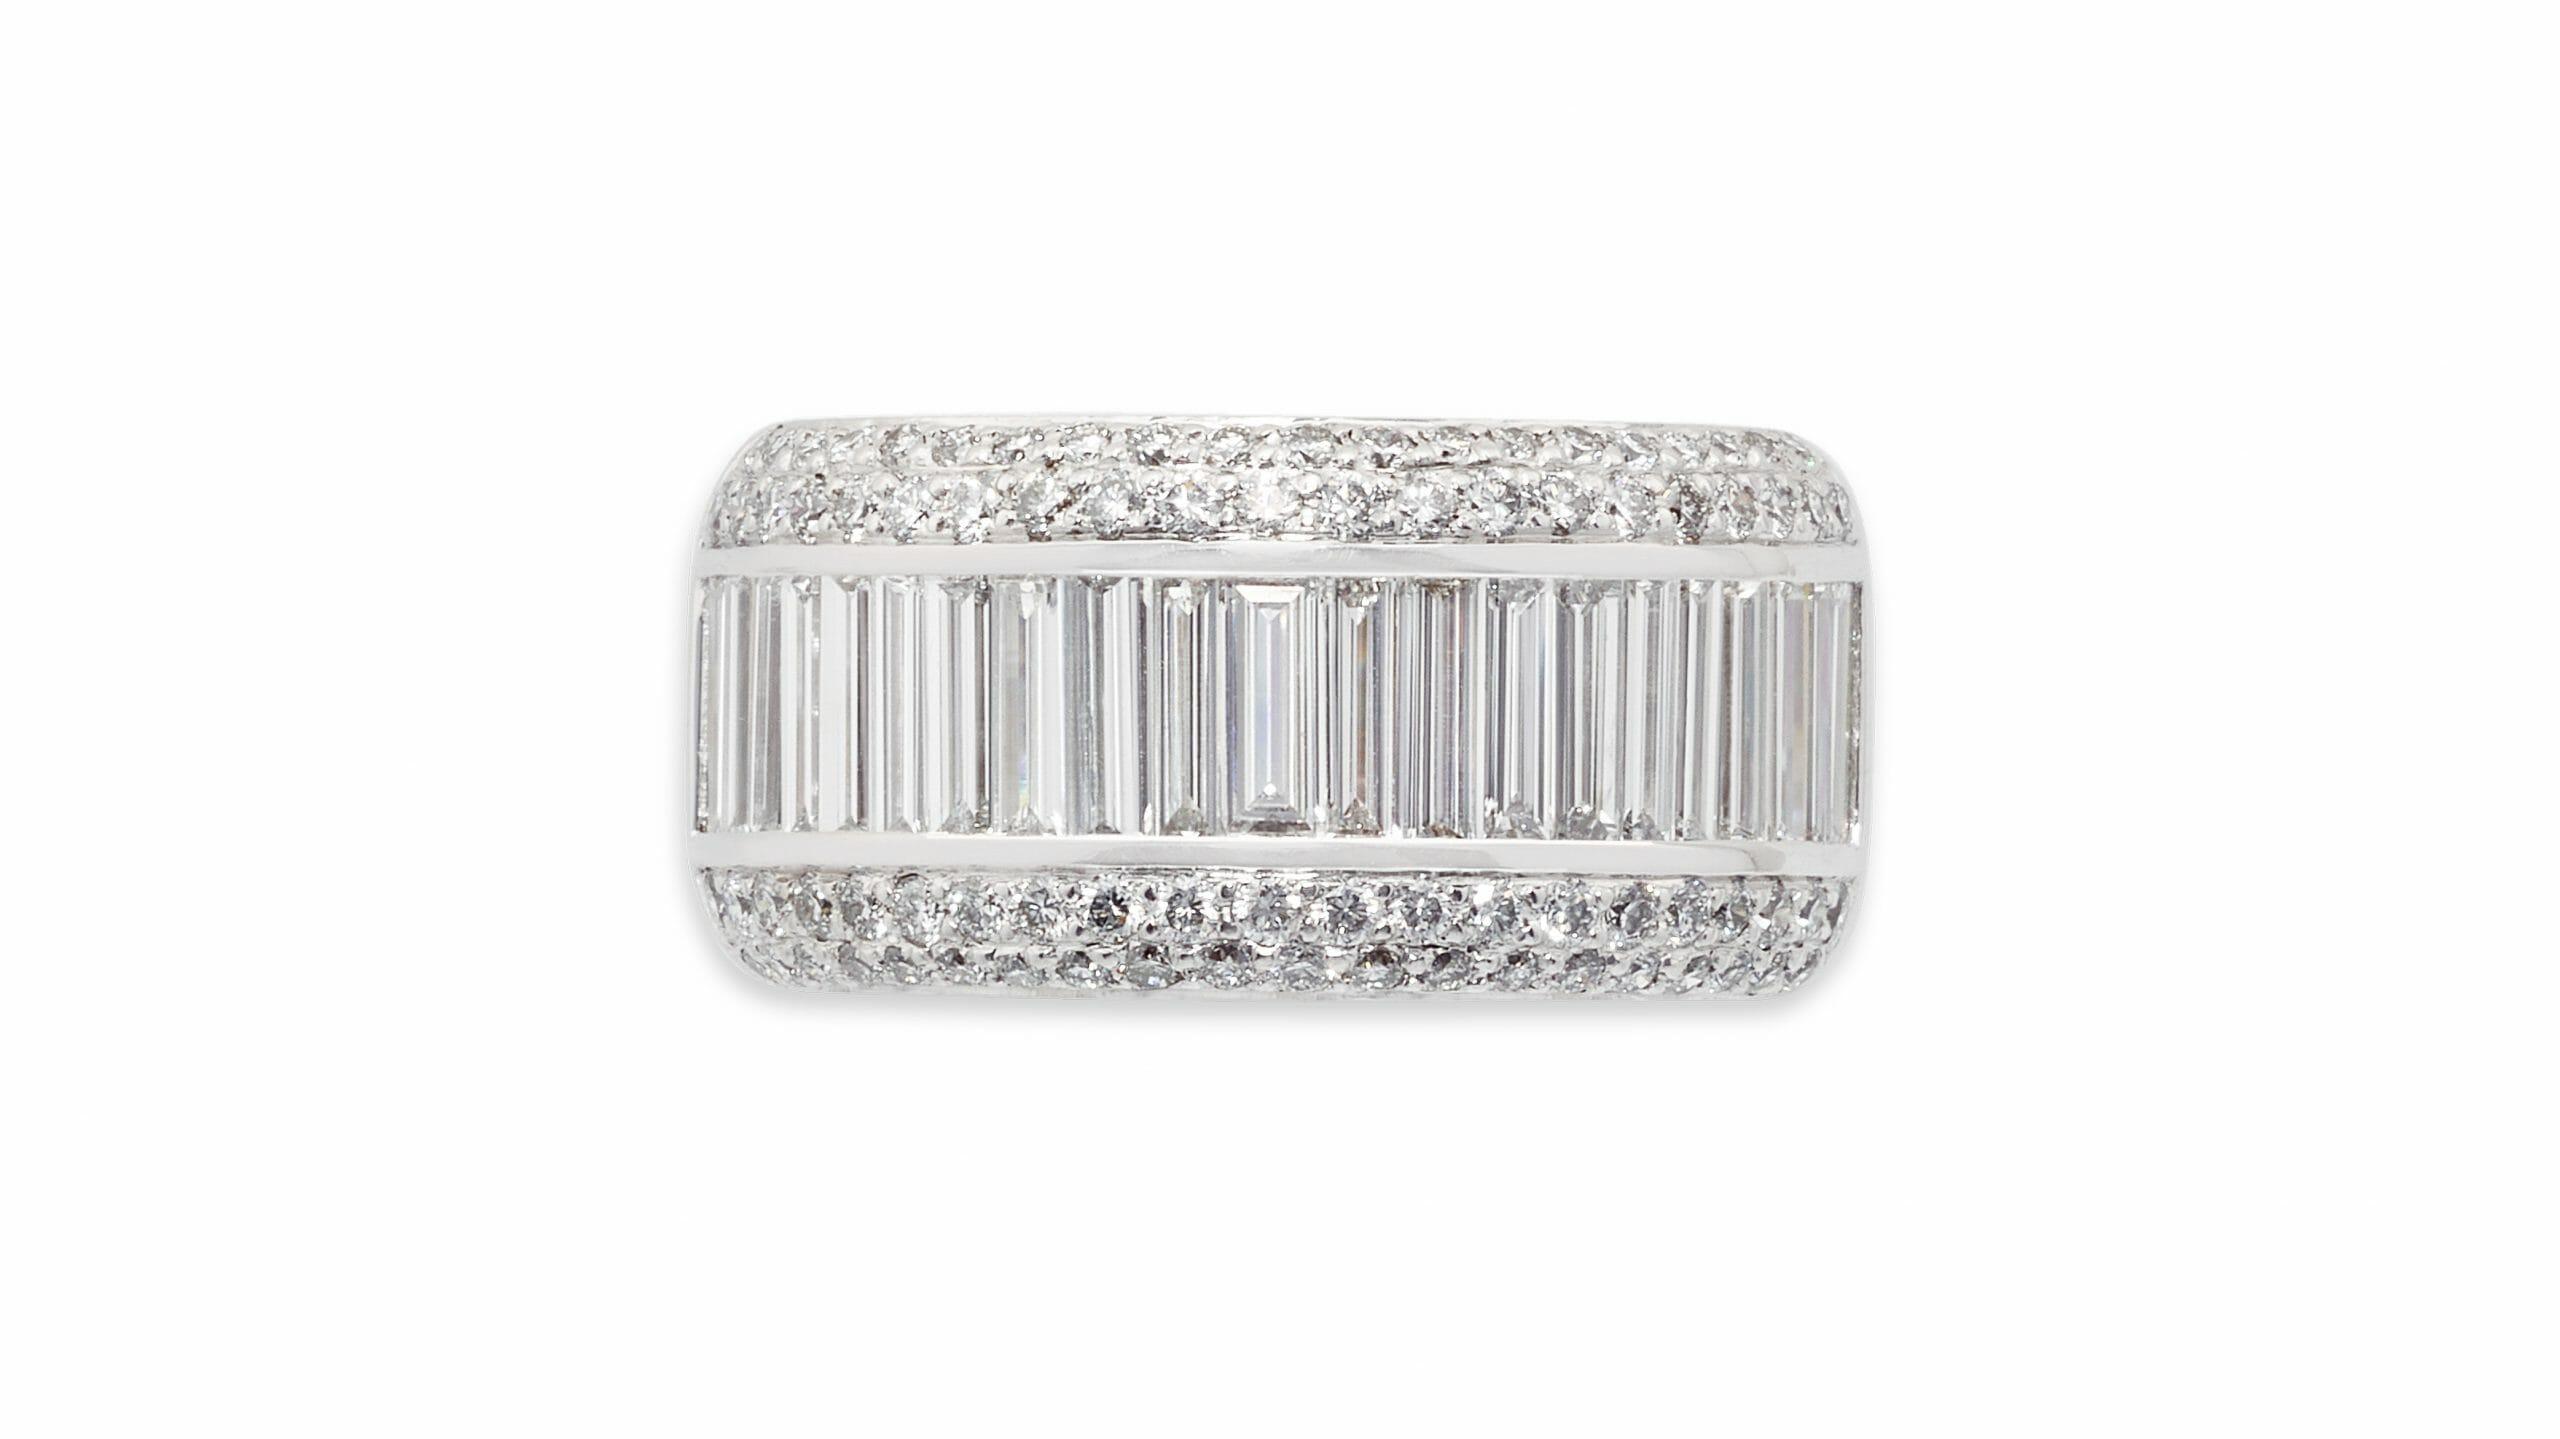 Round & Baguette Diamond Dress Ring | 18ct White Gold Dress Ring